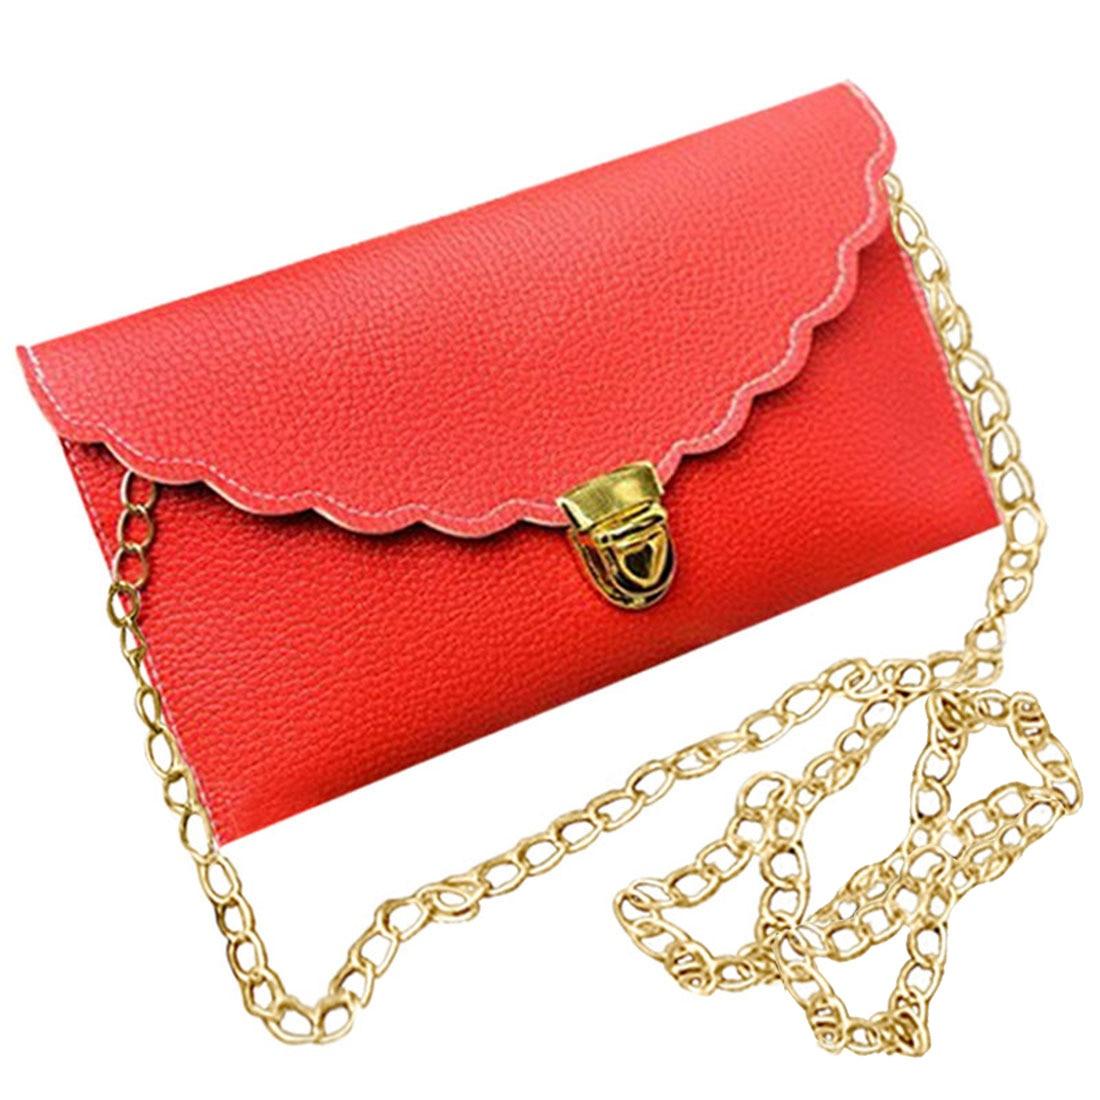 Ladies Handbag Imitation Leather Shoulder Bag Fashion Wallet Long ...